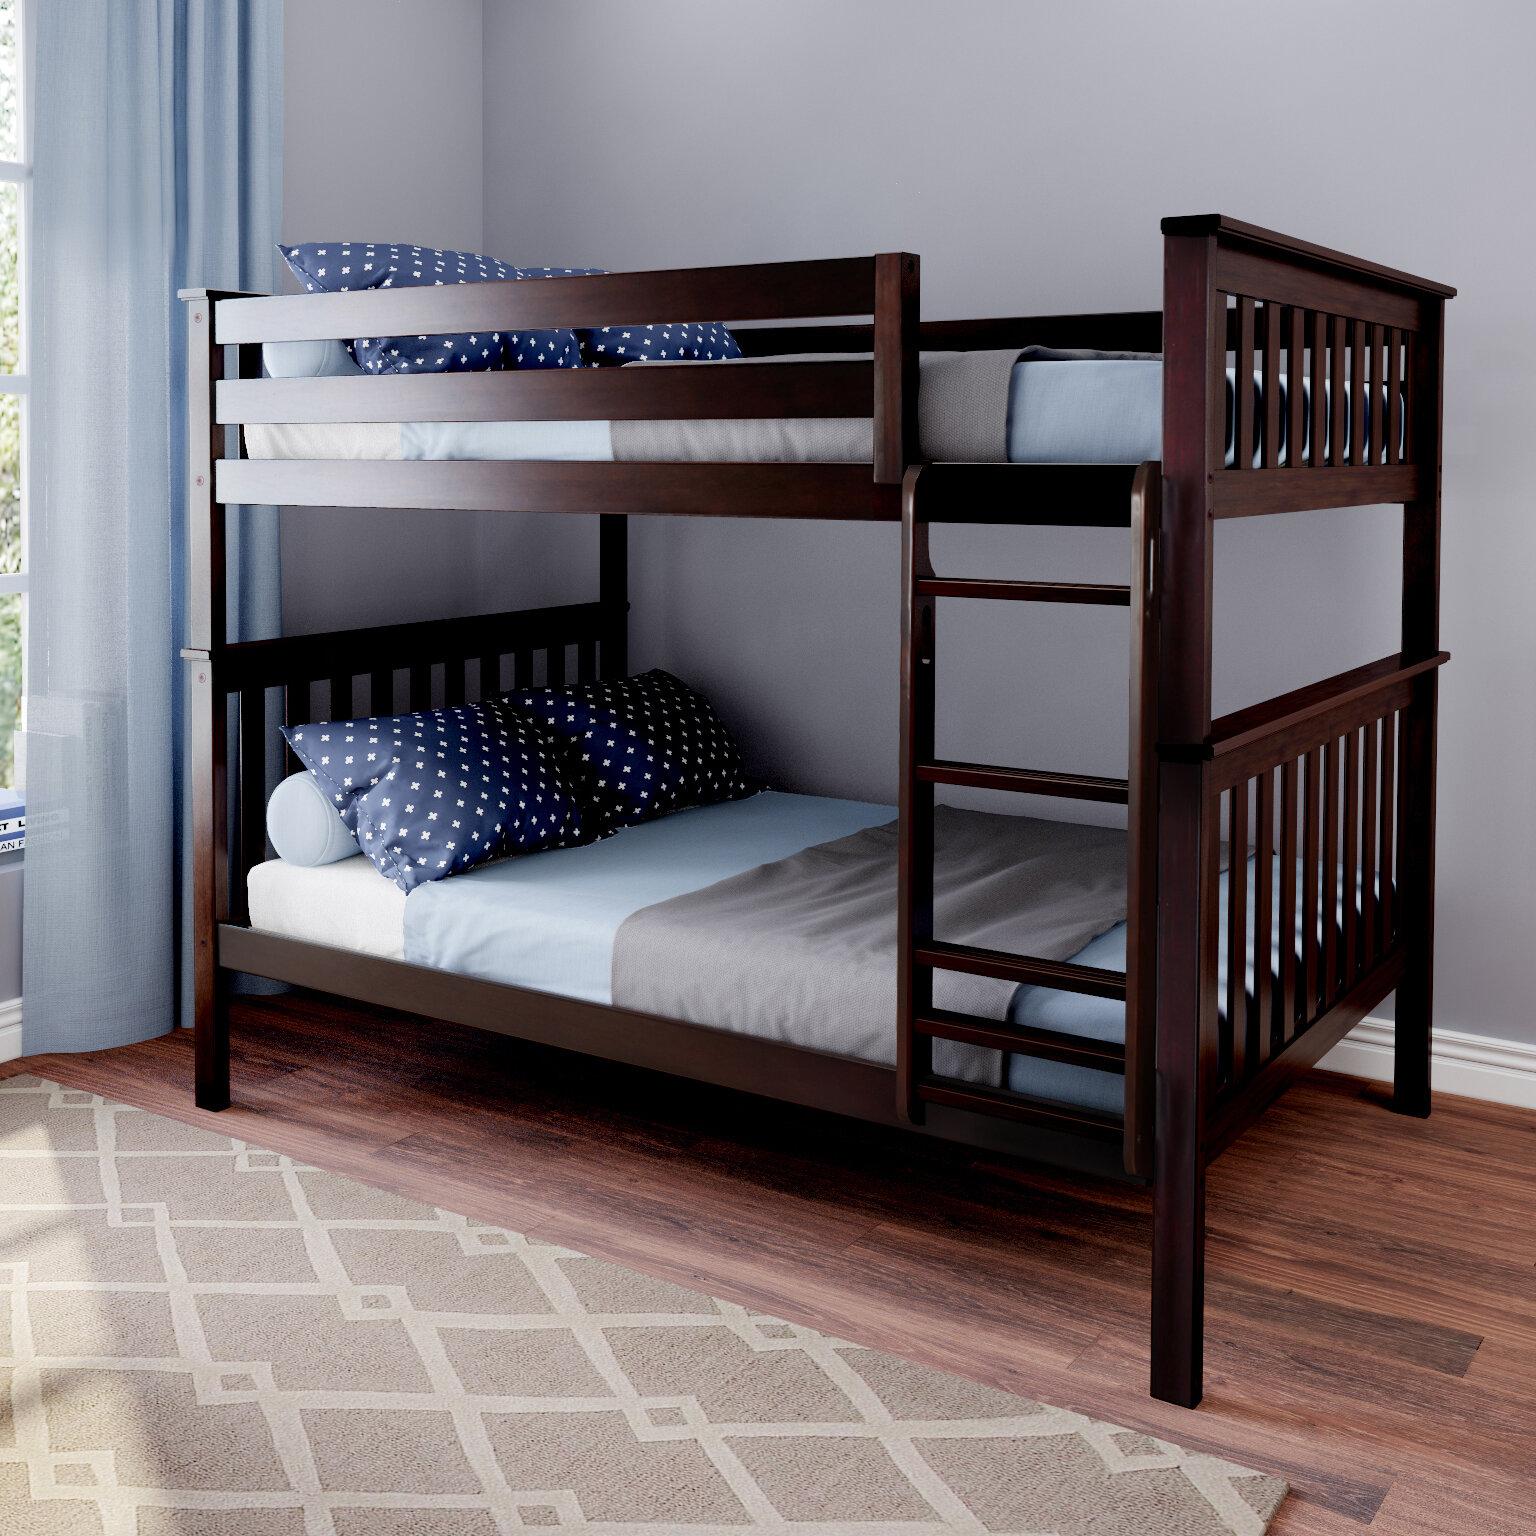 Harriet Bee Bolles Full Over Full Solid Wood Standard Bunk Bed By Harriet Bee Reviews Wayfair